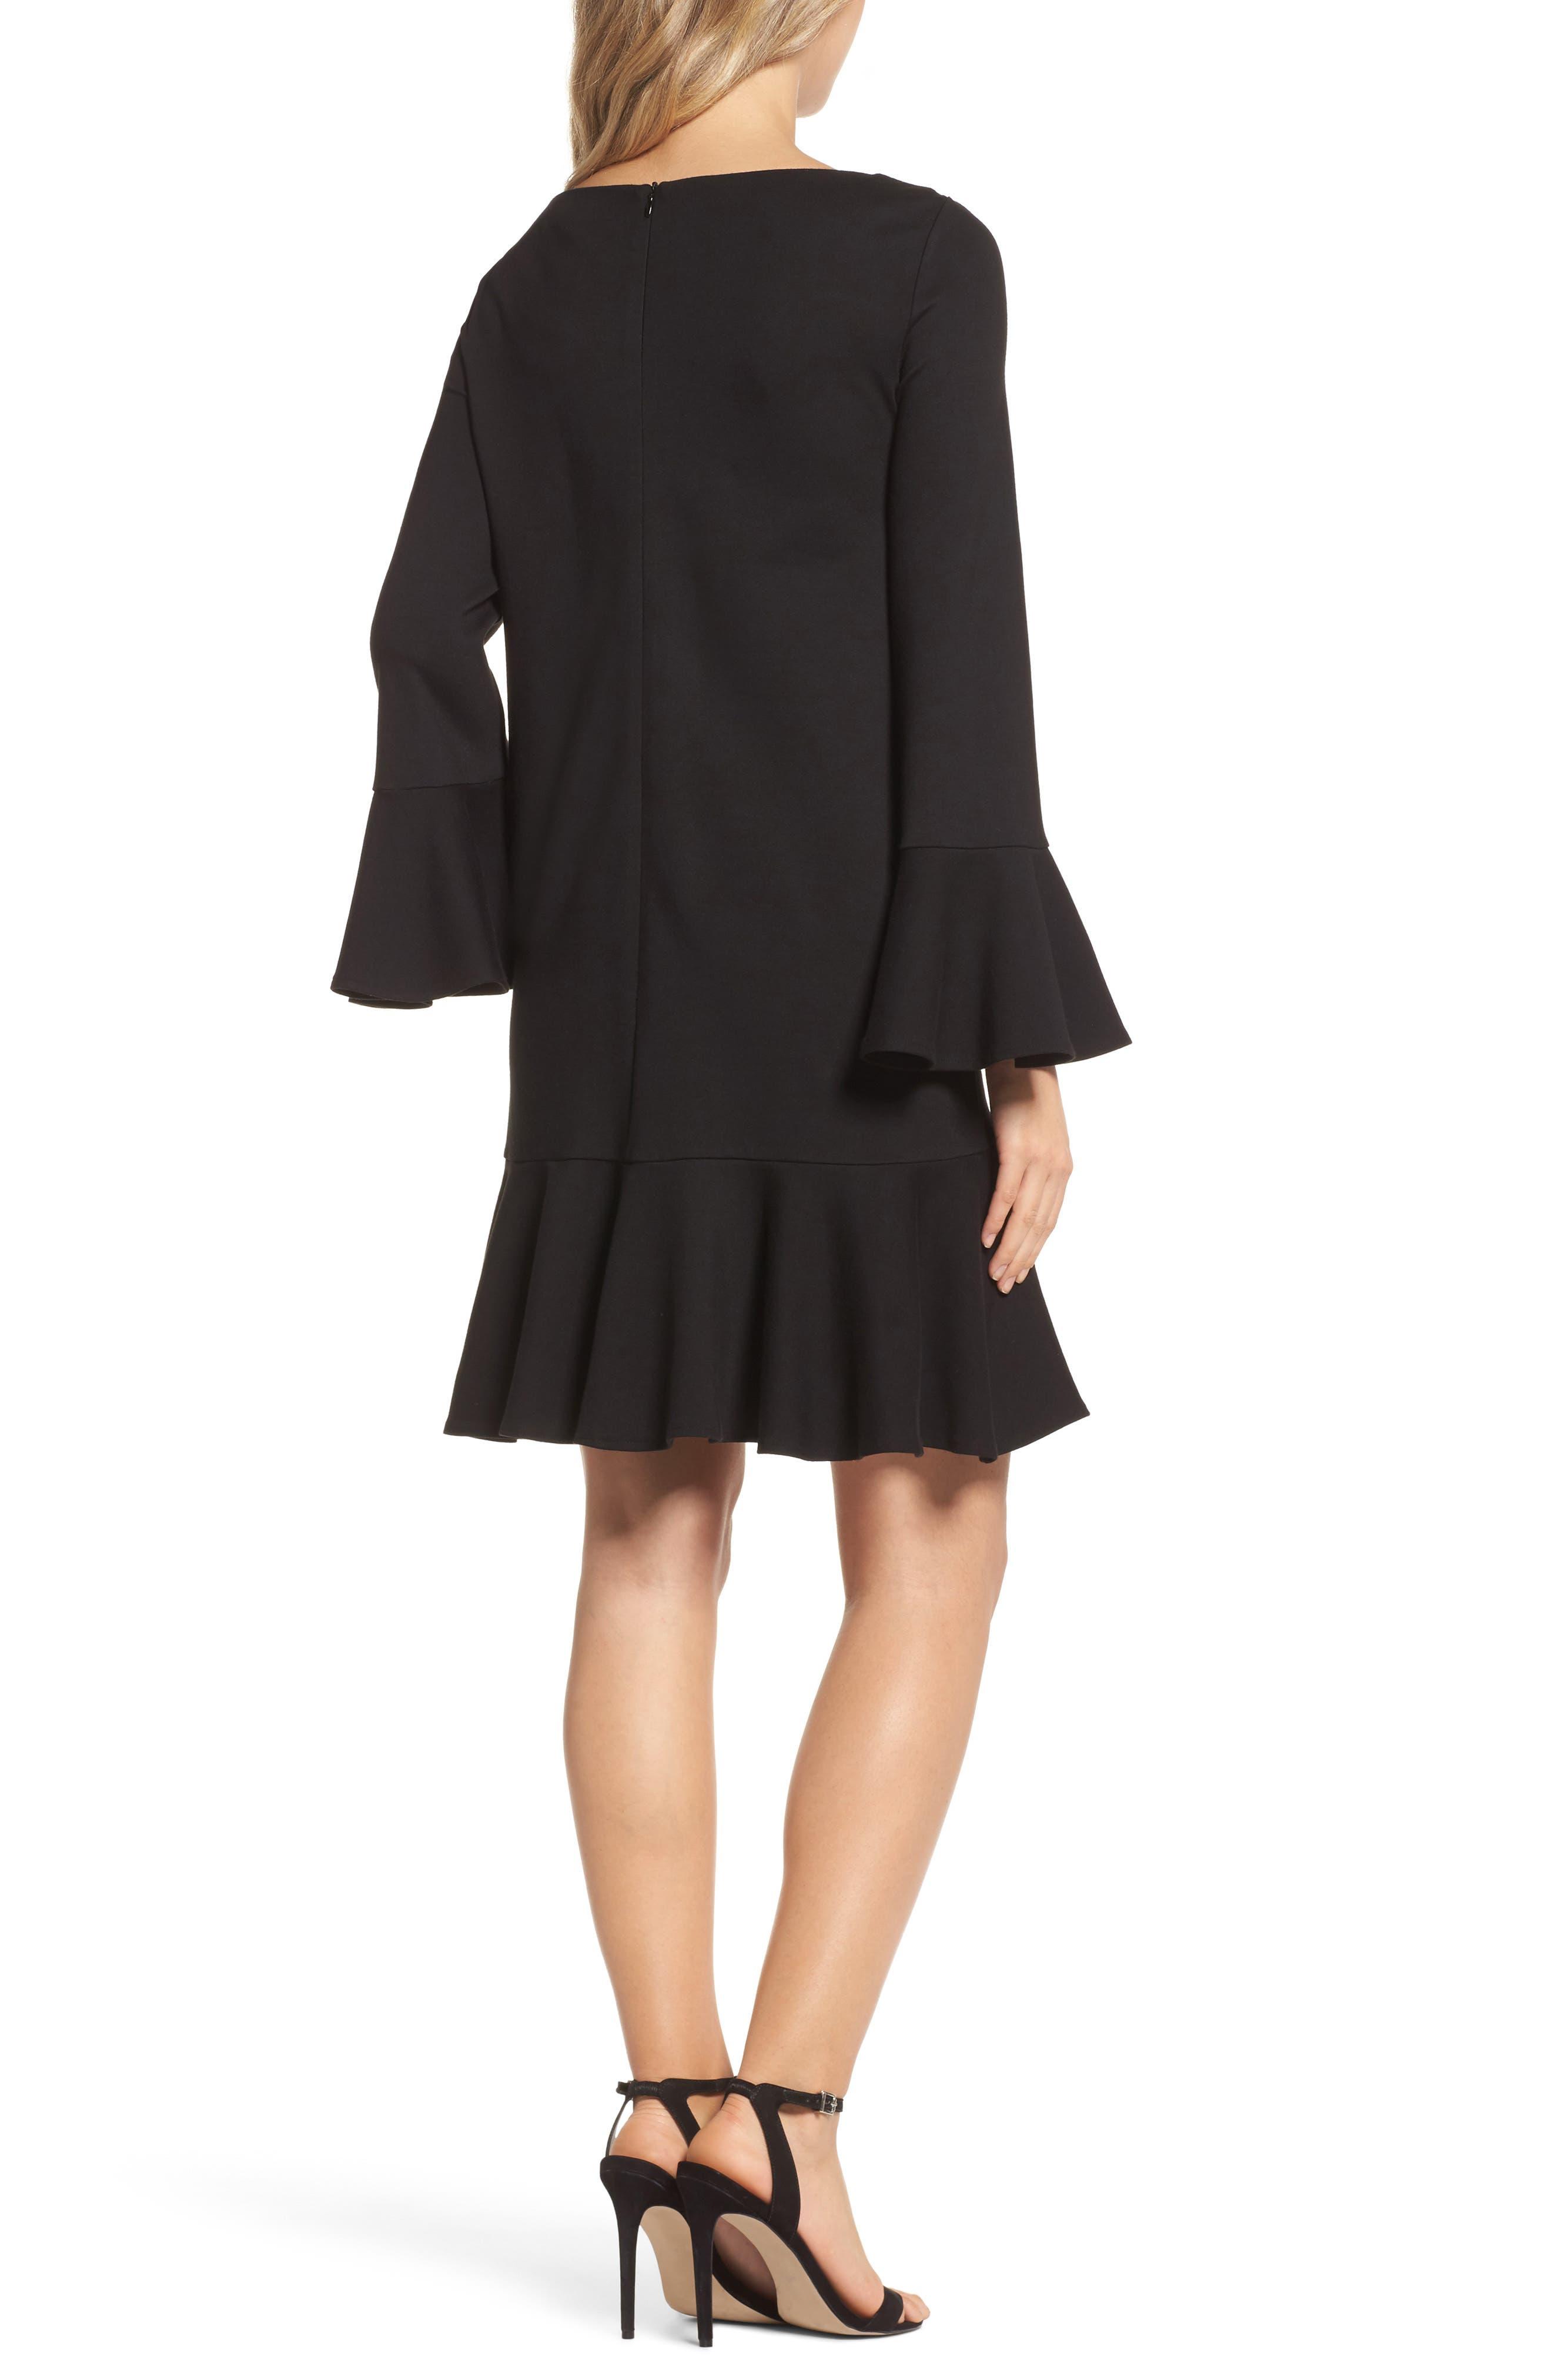 Matuku Lula Bell Sleeve Dress,                             Alternate thumbnail 2, color,                             Black